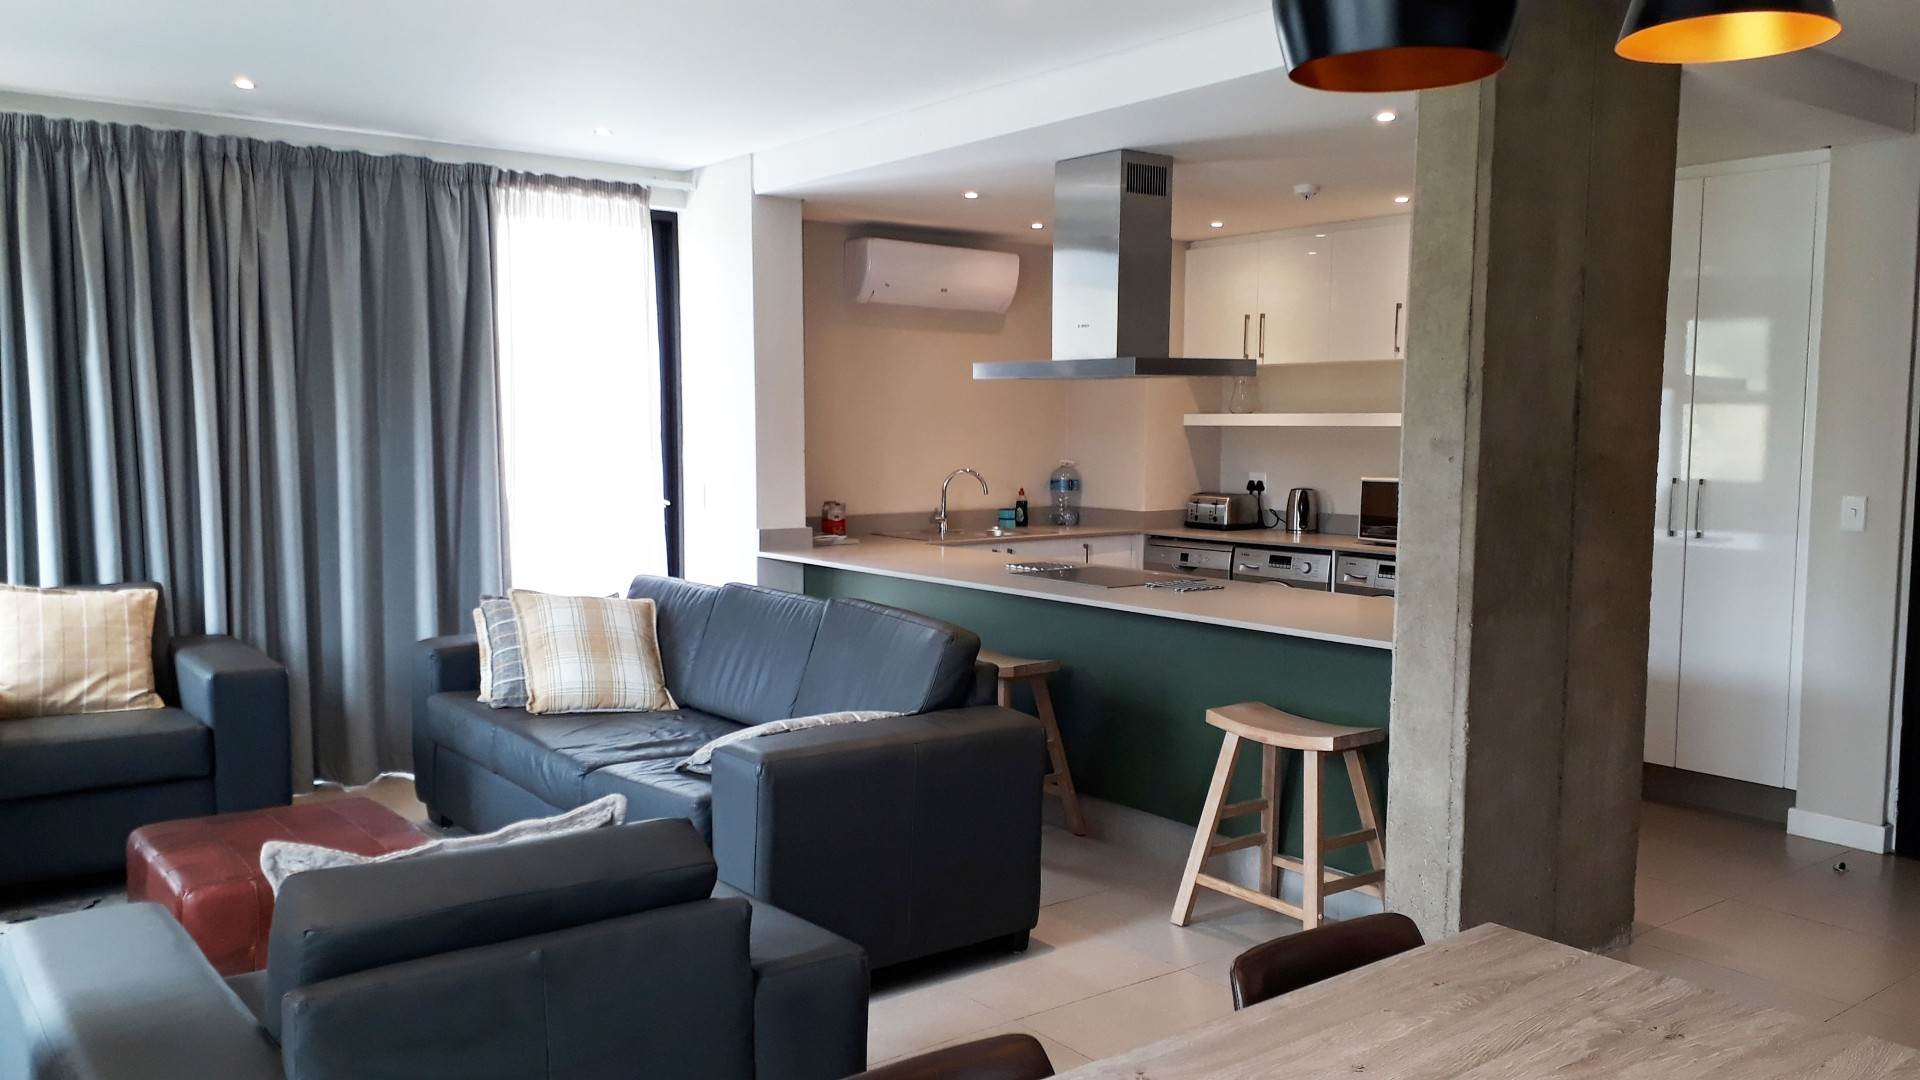 3 BedroomApartment To Rent In Sandton Cbd